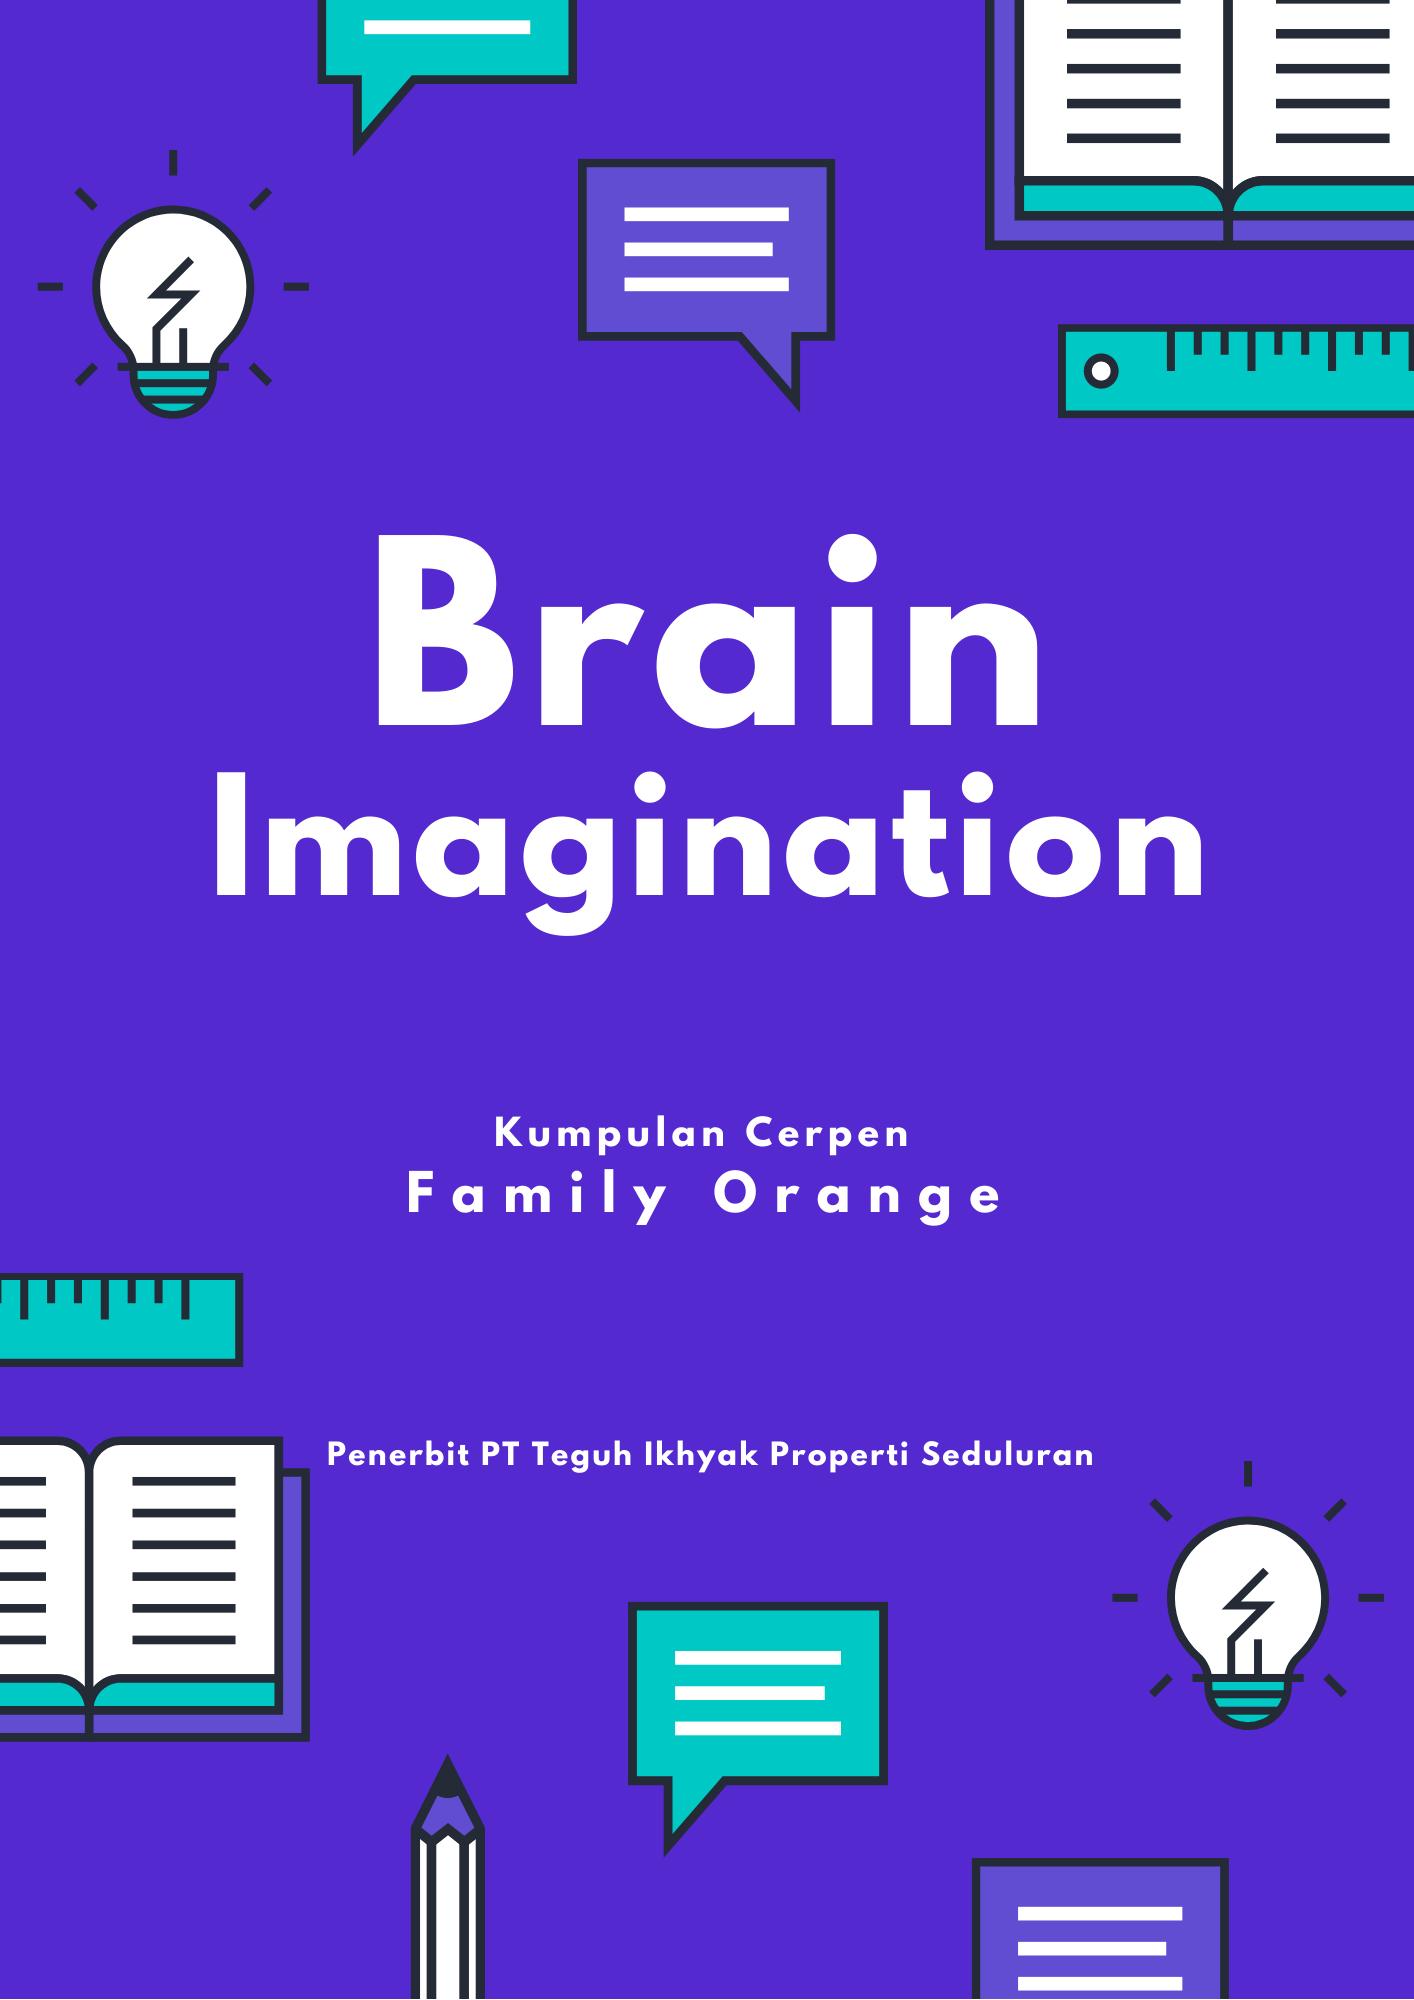 Brain imagination [sumber elektronis]